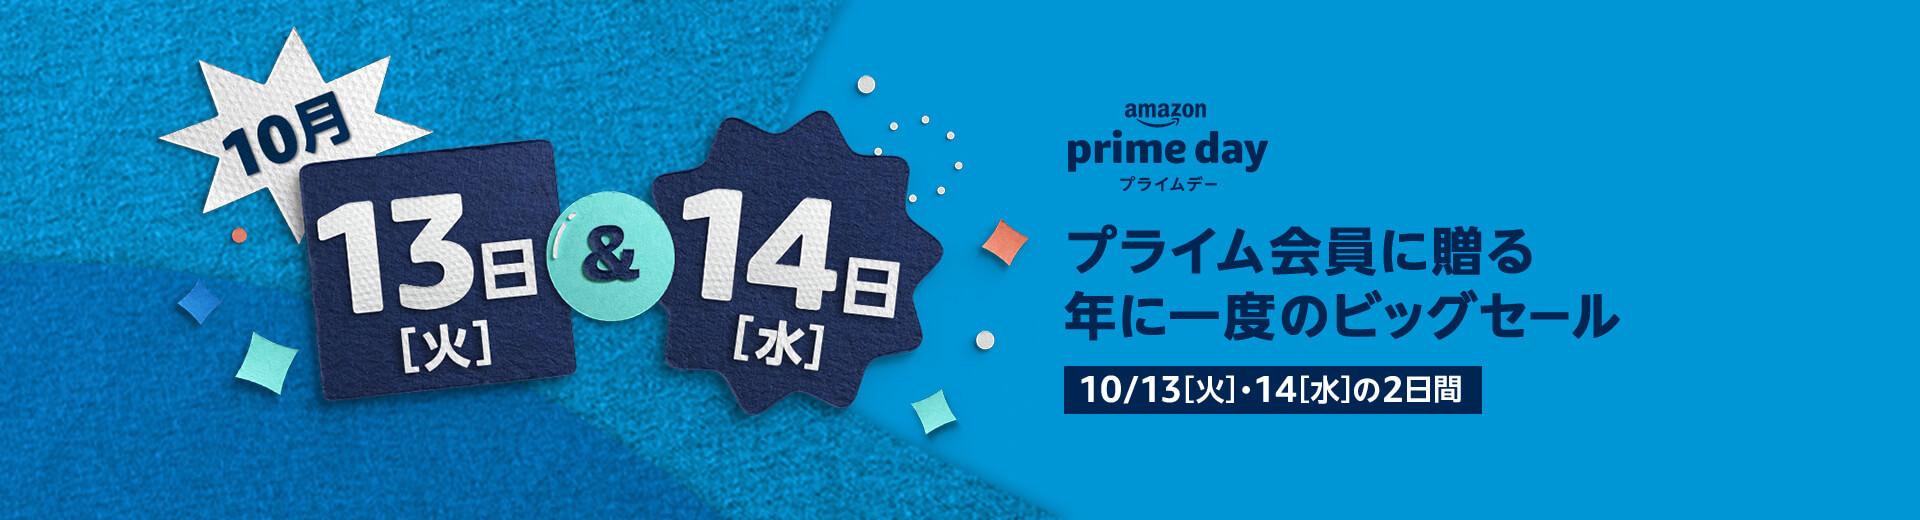 Amazonプライムデーに登場する商品第3弾が発表!調理器具や美容ケア商品など多数&Prime Videoの100円セールも実施 tech201009_amazonprimeday_2